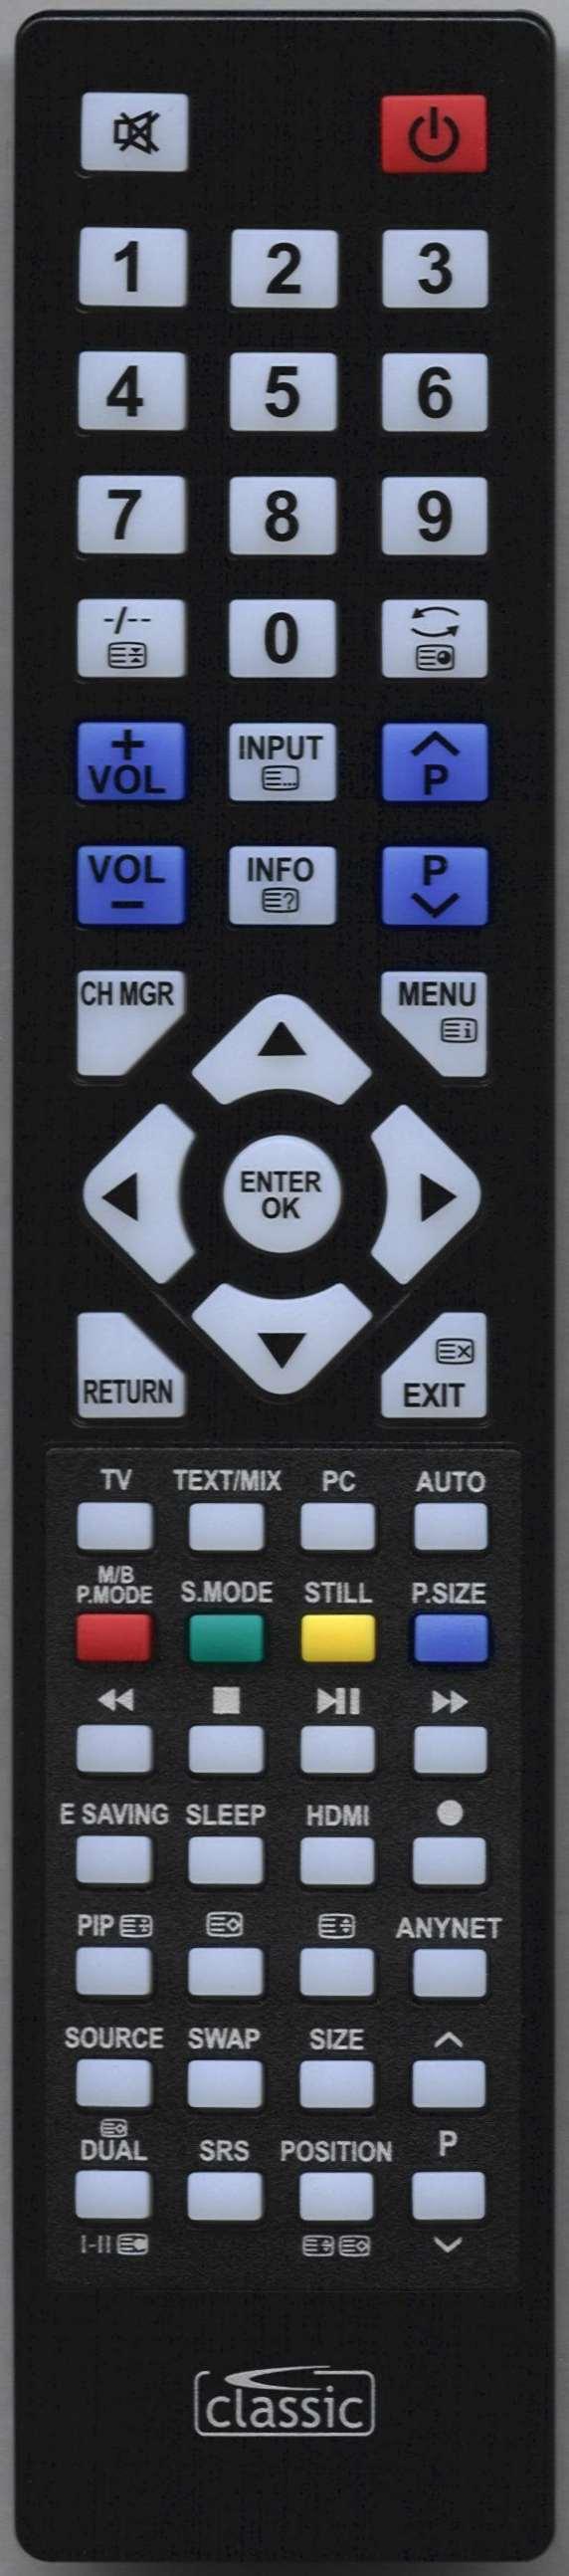 SAMSUNG 932MW Remote Control